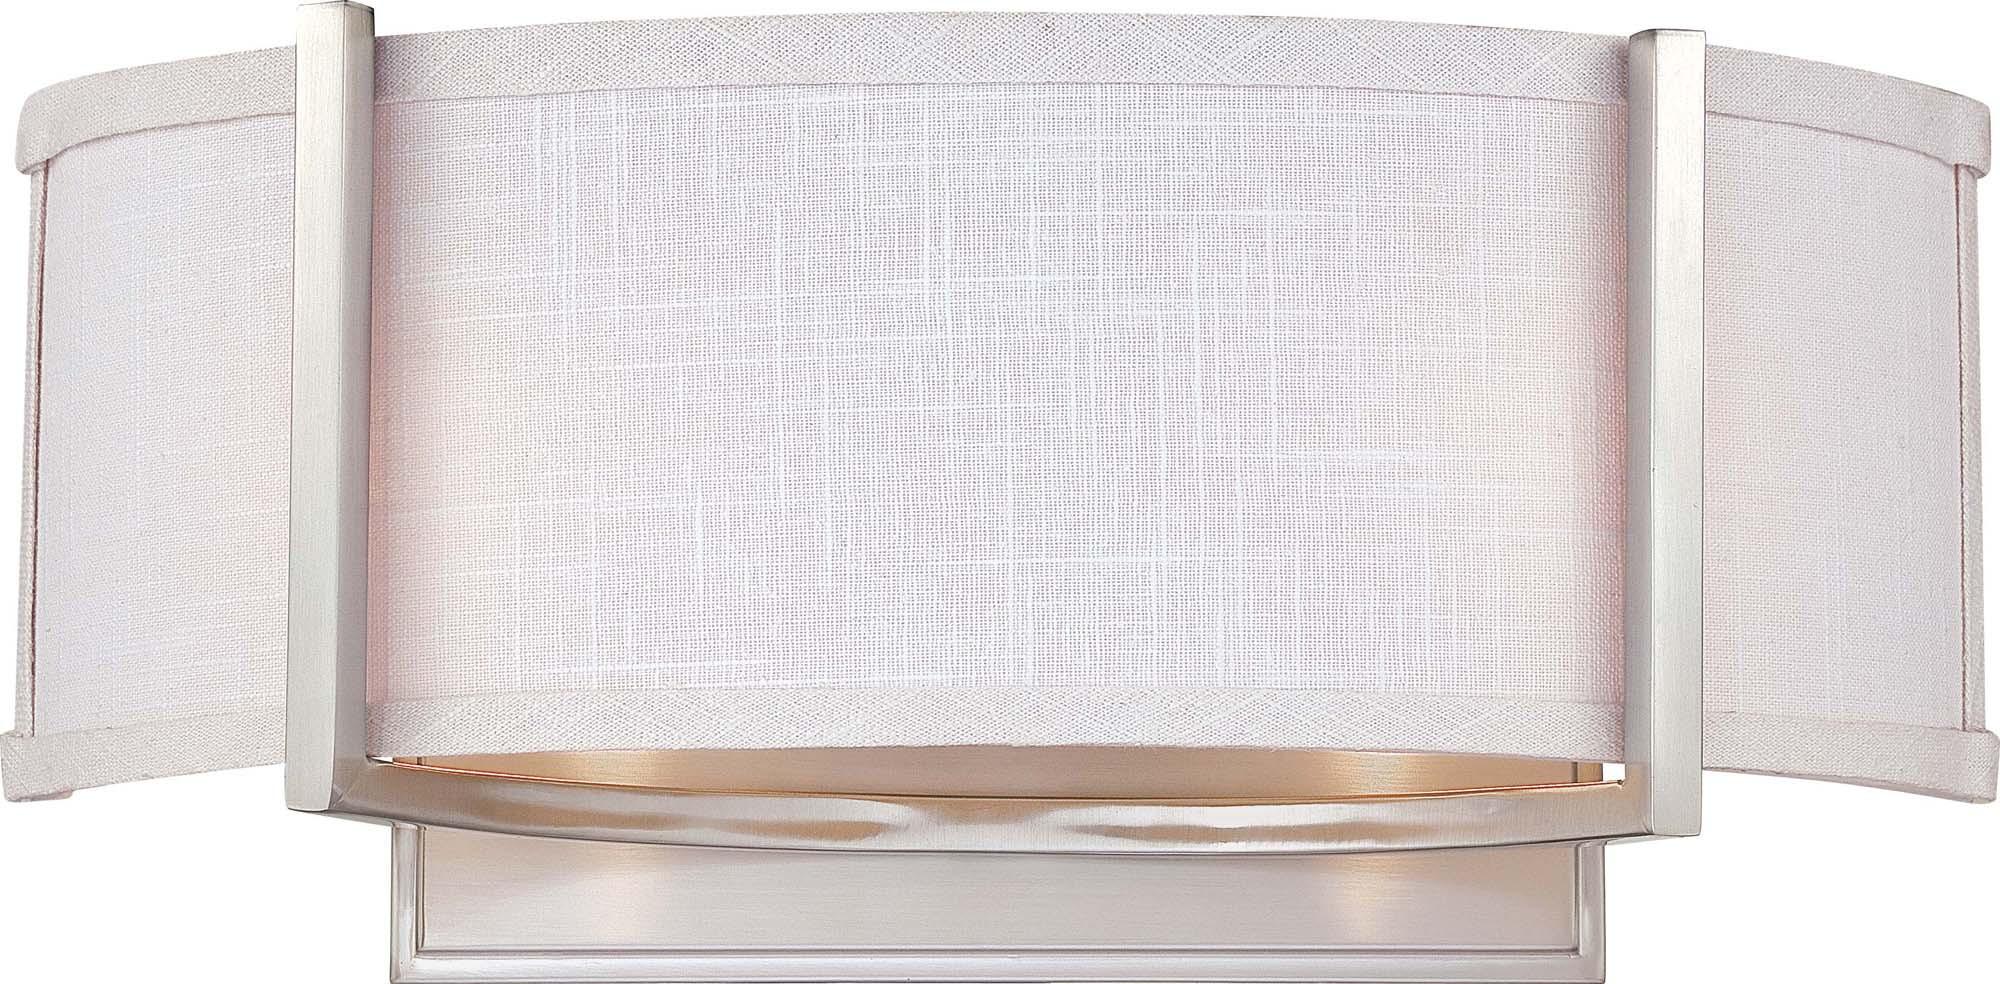 Nuvo Gemini - 2 Light Wall Sconce w/ Slate Gray Fabric Shade eBay